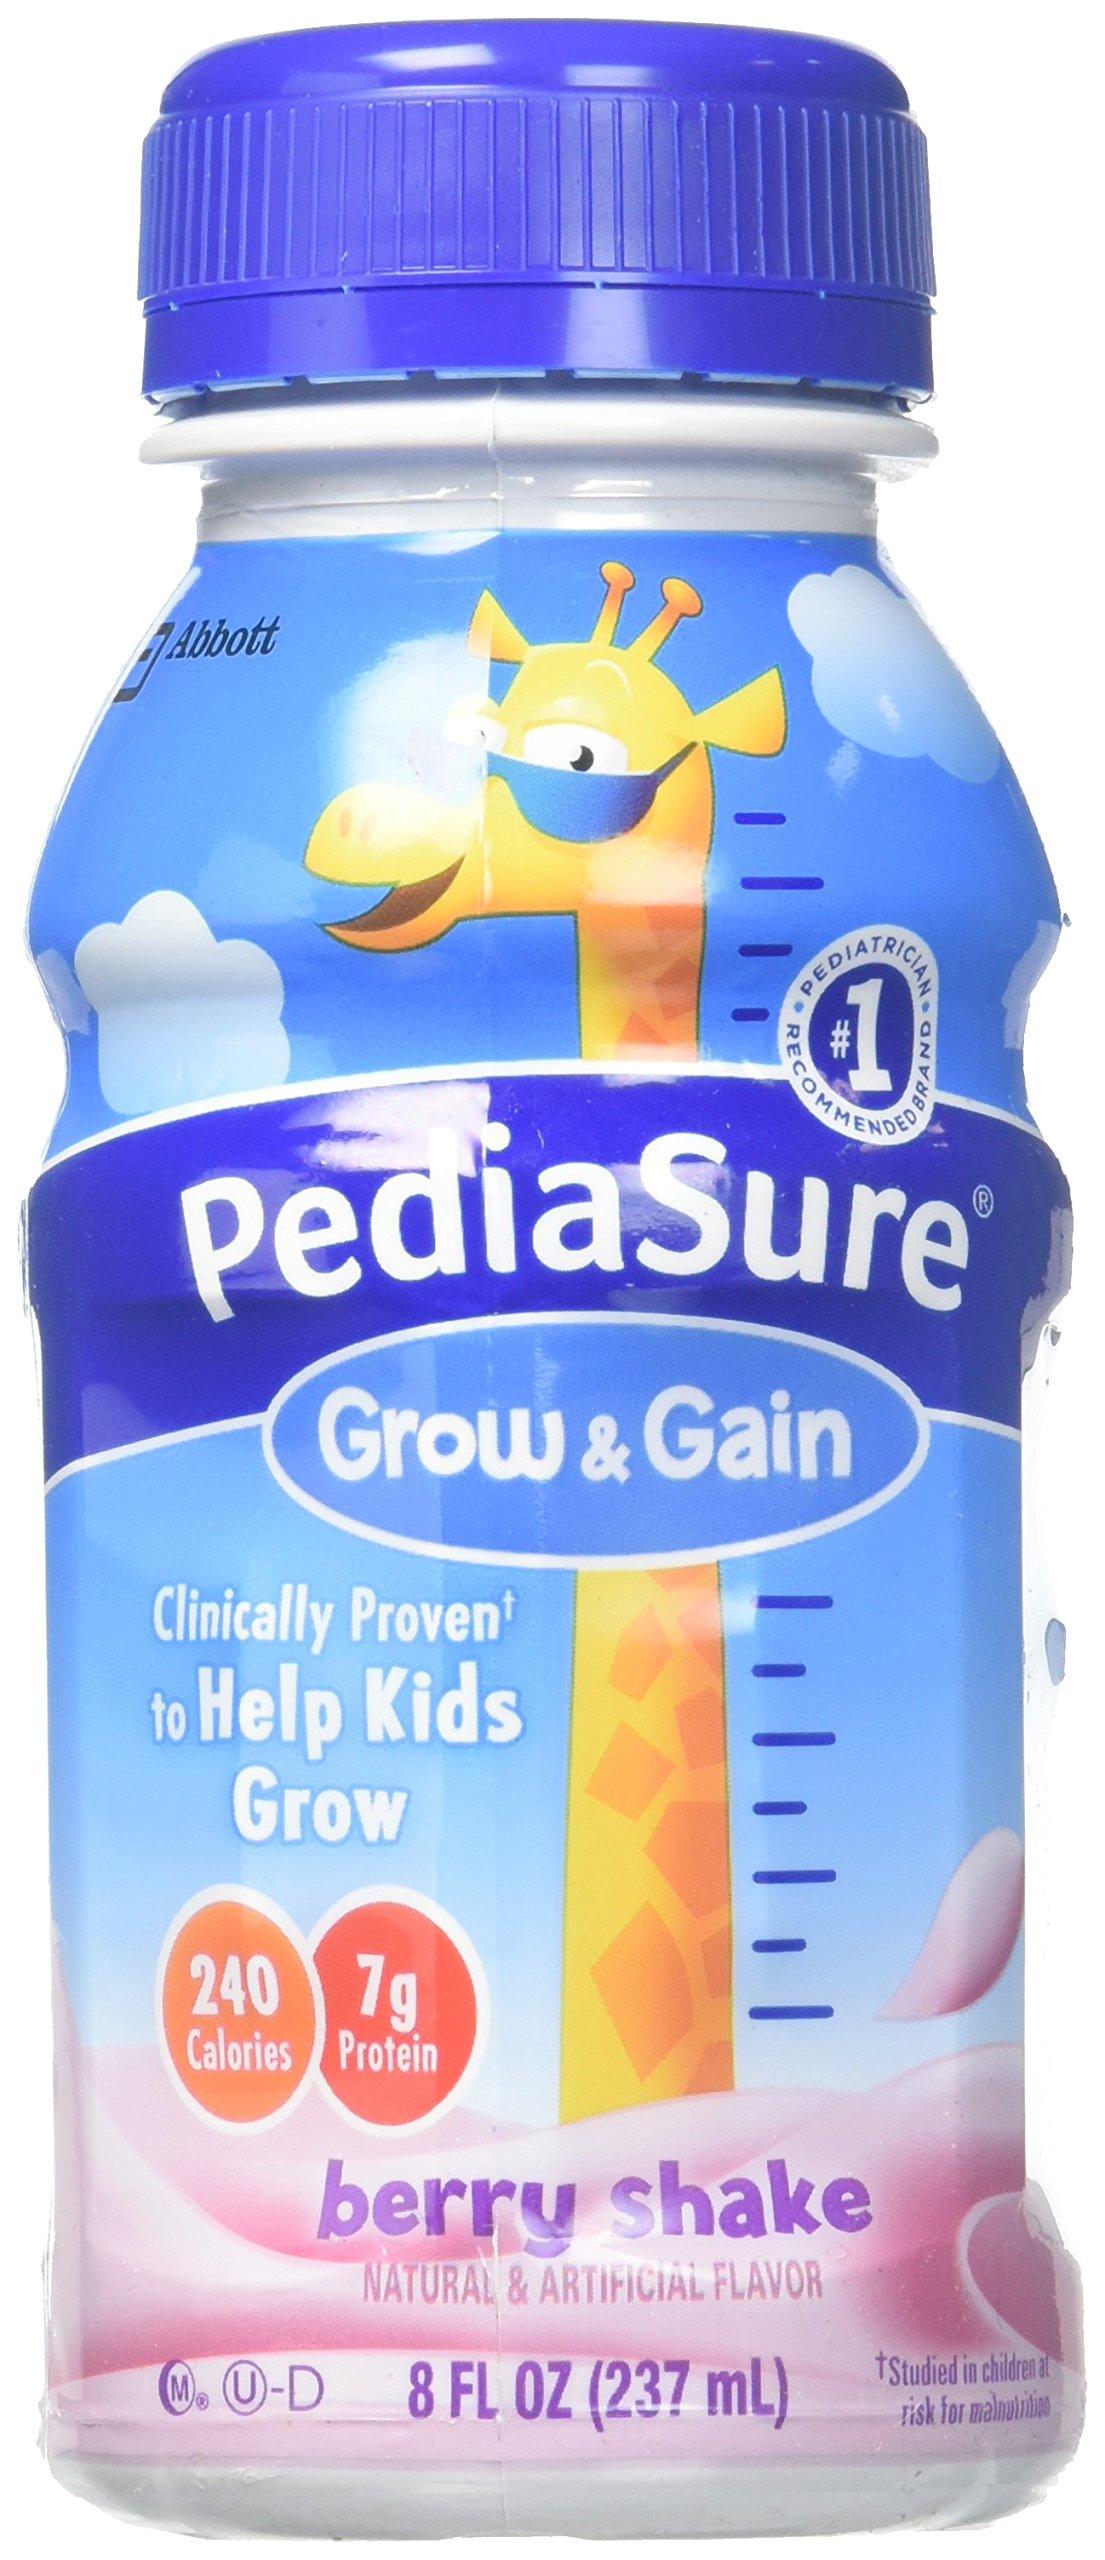 Pediasure Regular Nutrition Drink Bottles - Berry - 8 oz - 24 pk